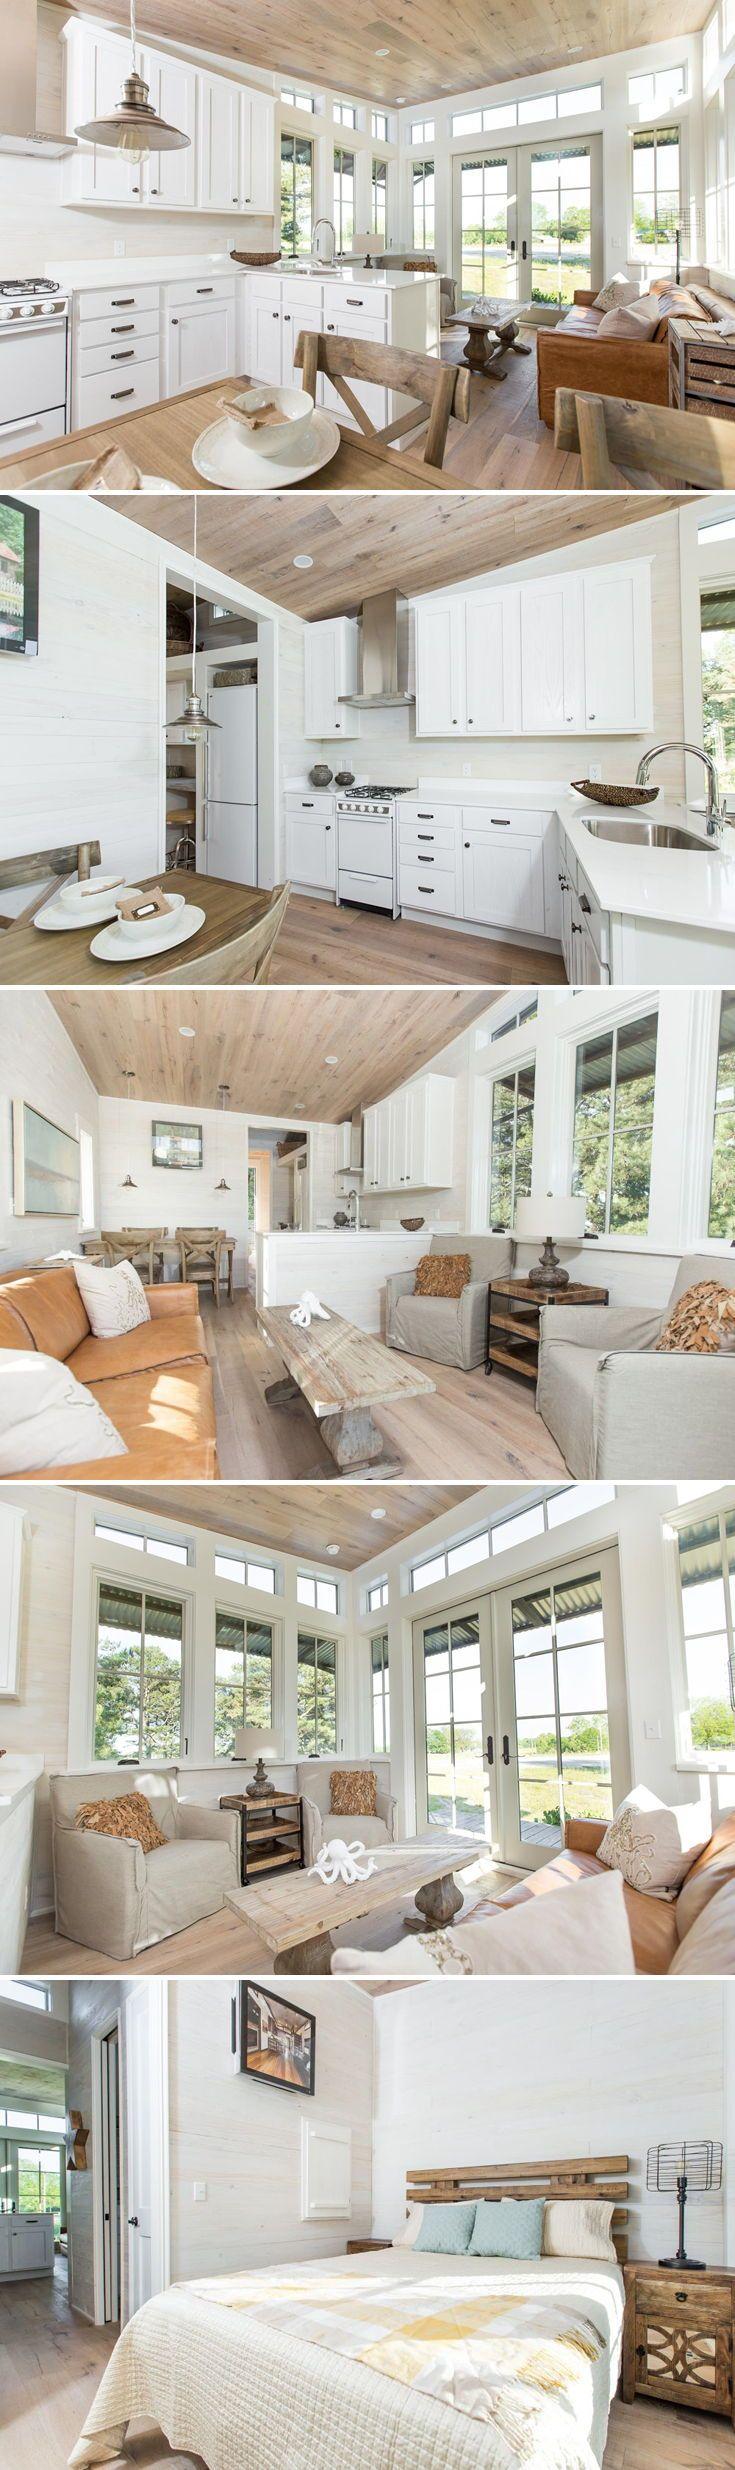 Saltbox by Clayton Tiny Homes | Shiplap wood, Wood siding and Oak ...